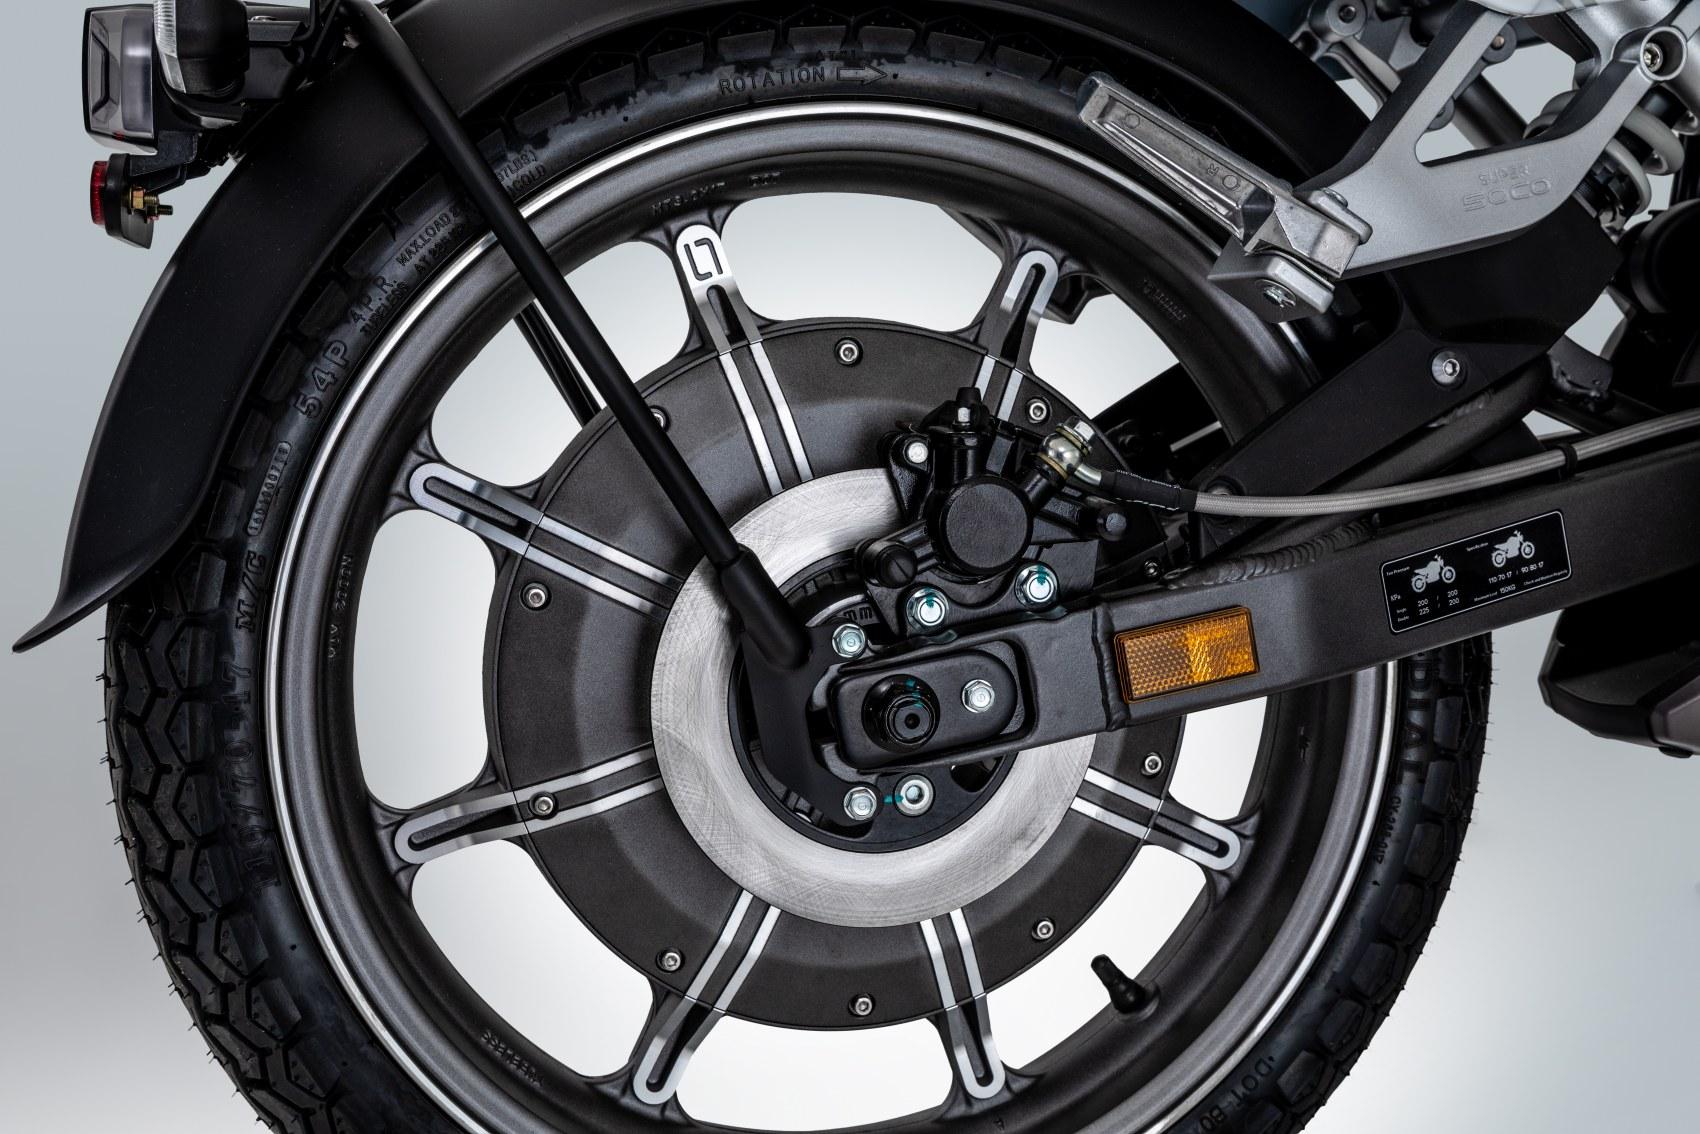 Super Soco TC electric motorcycle rear hub motor